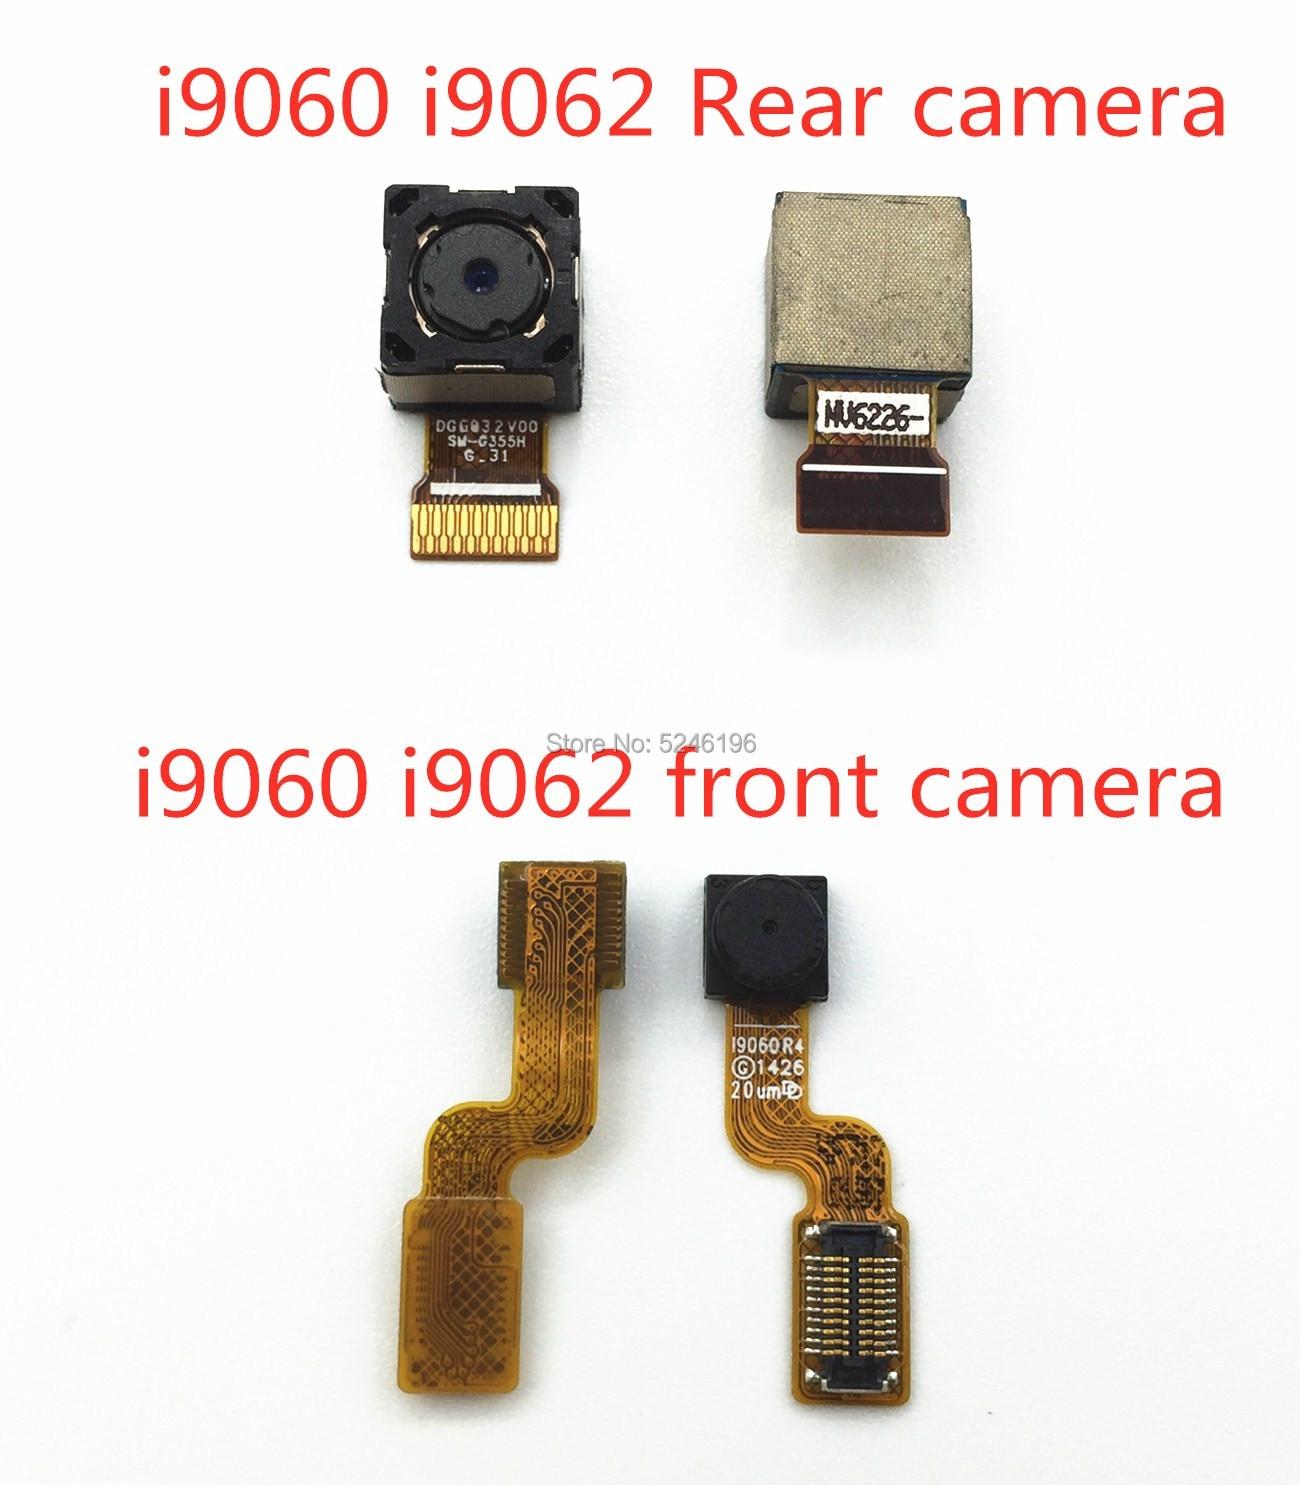 1pcs Back big Main Rear Camera front camera Module Flex Cable For Samsung Galaxy i9060 i9062 Back Ma